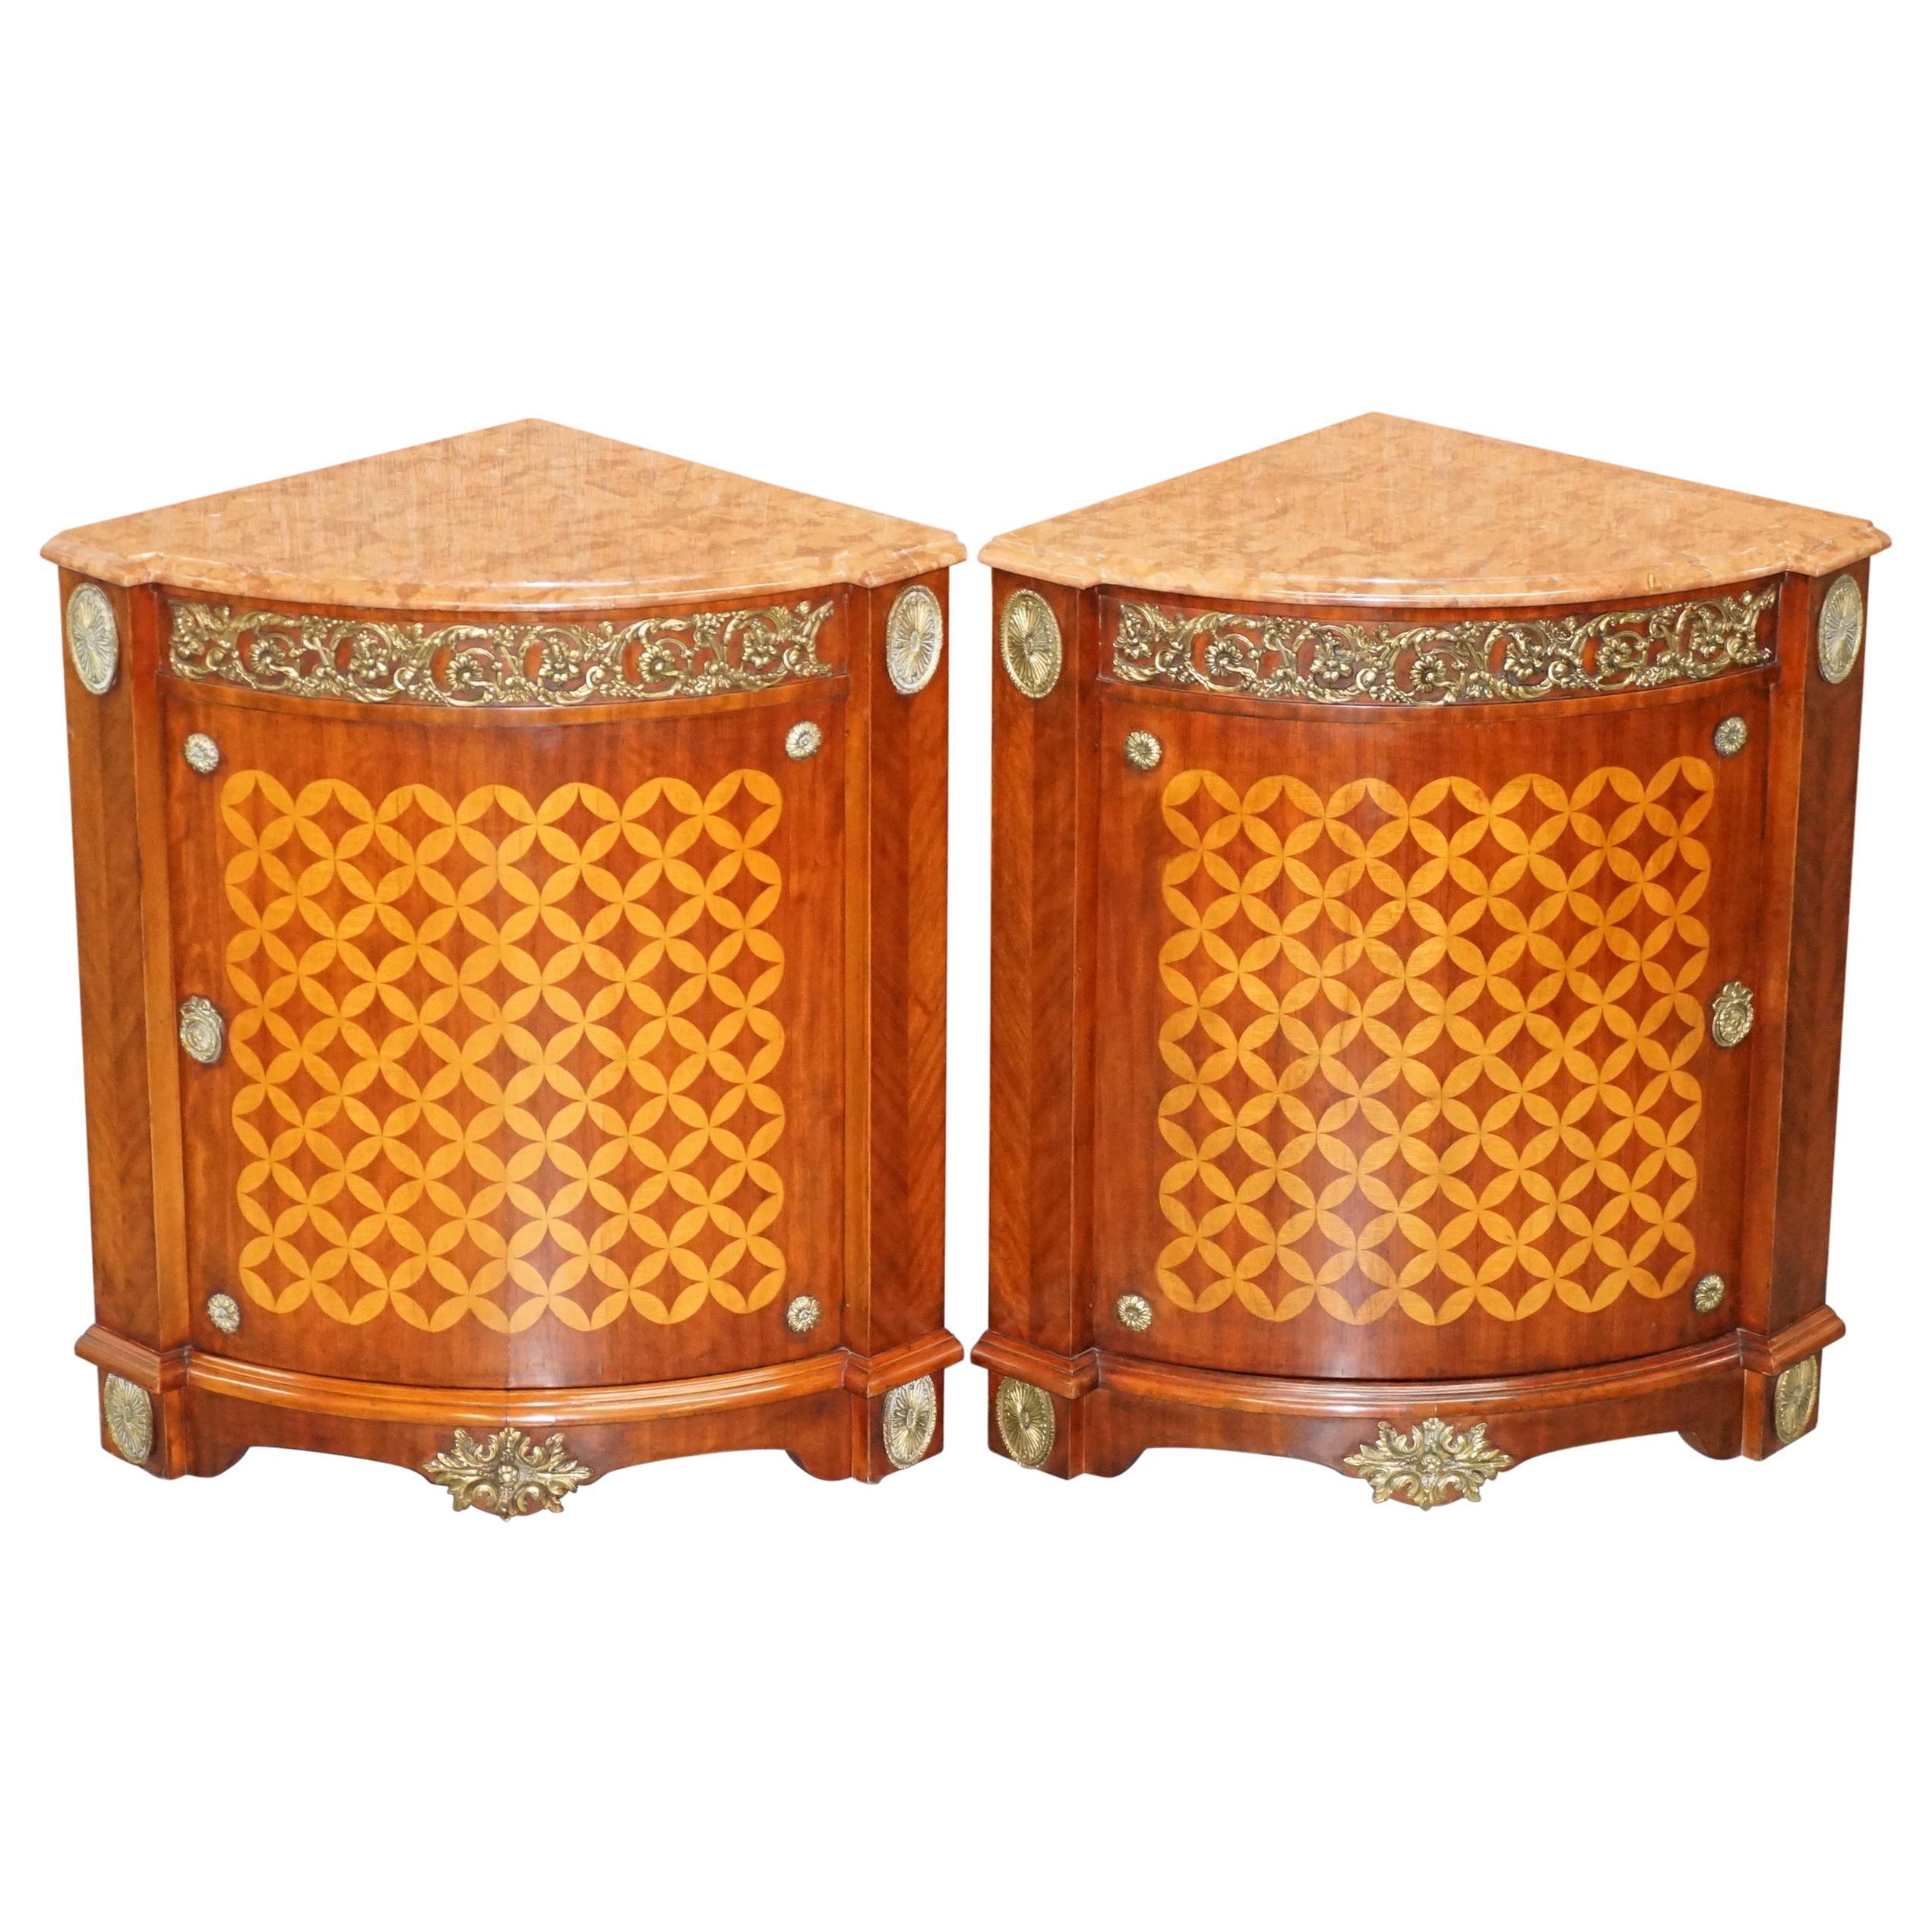 Pair of French Louis XVI Style Gilt Bronze, Hardwood & Marble Corner Cupboards